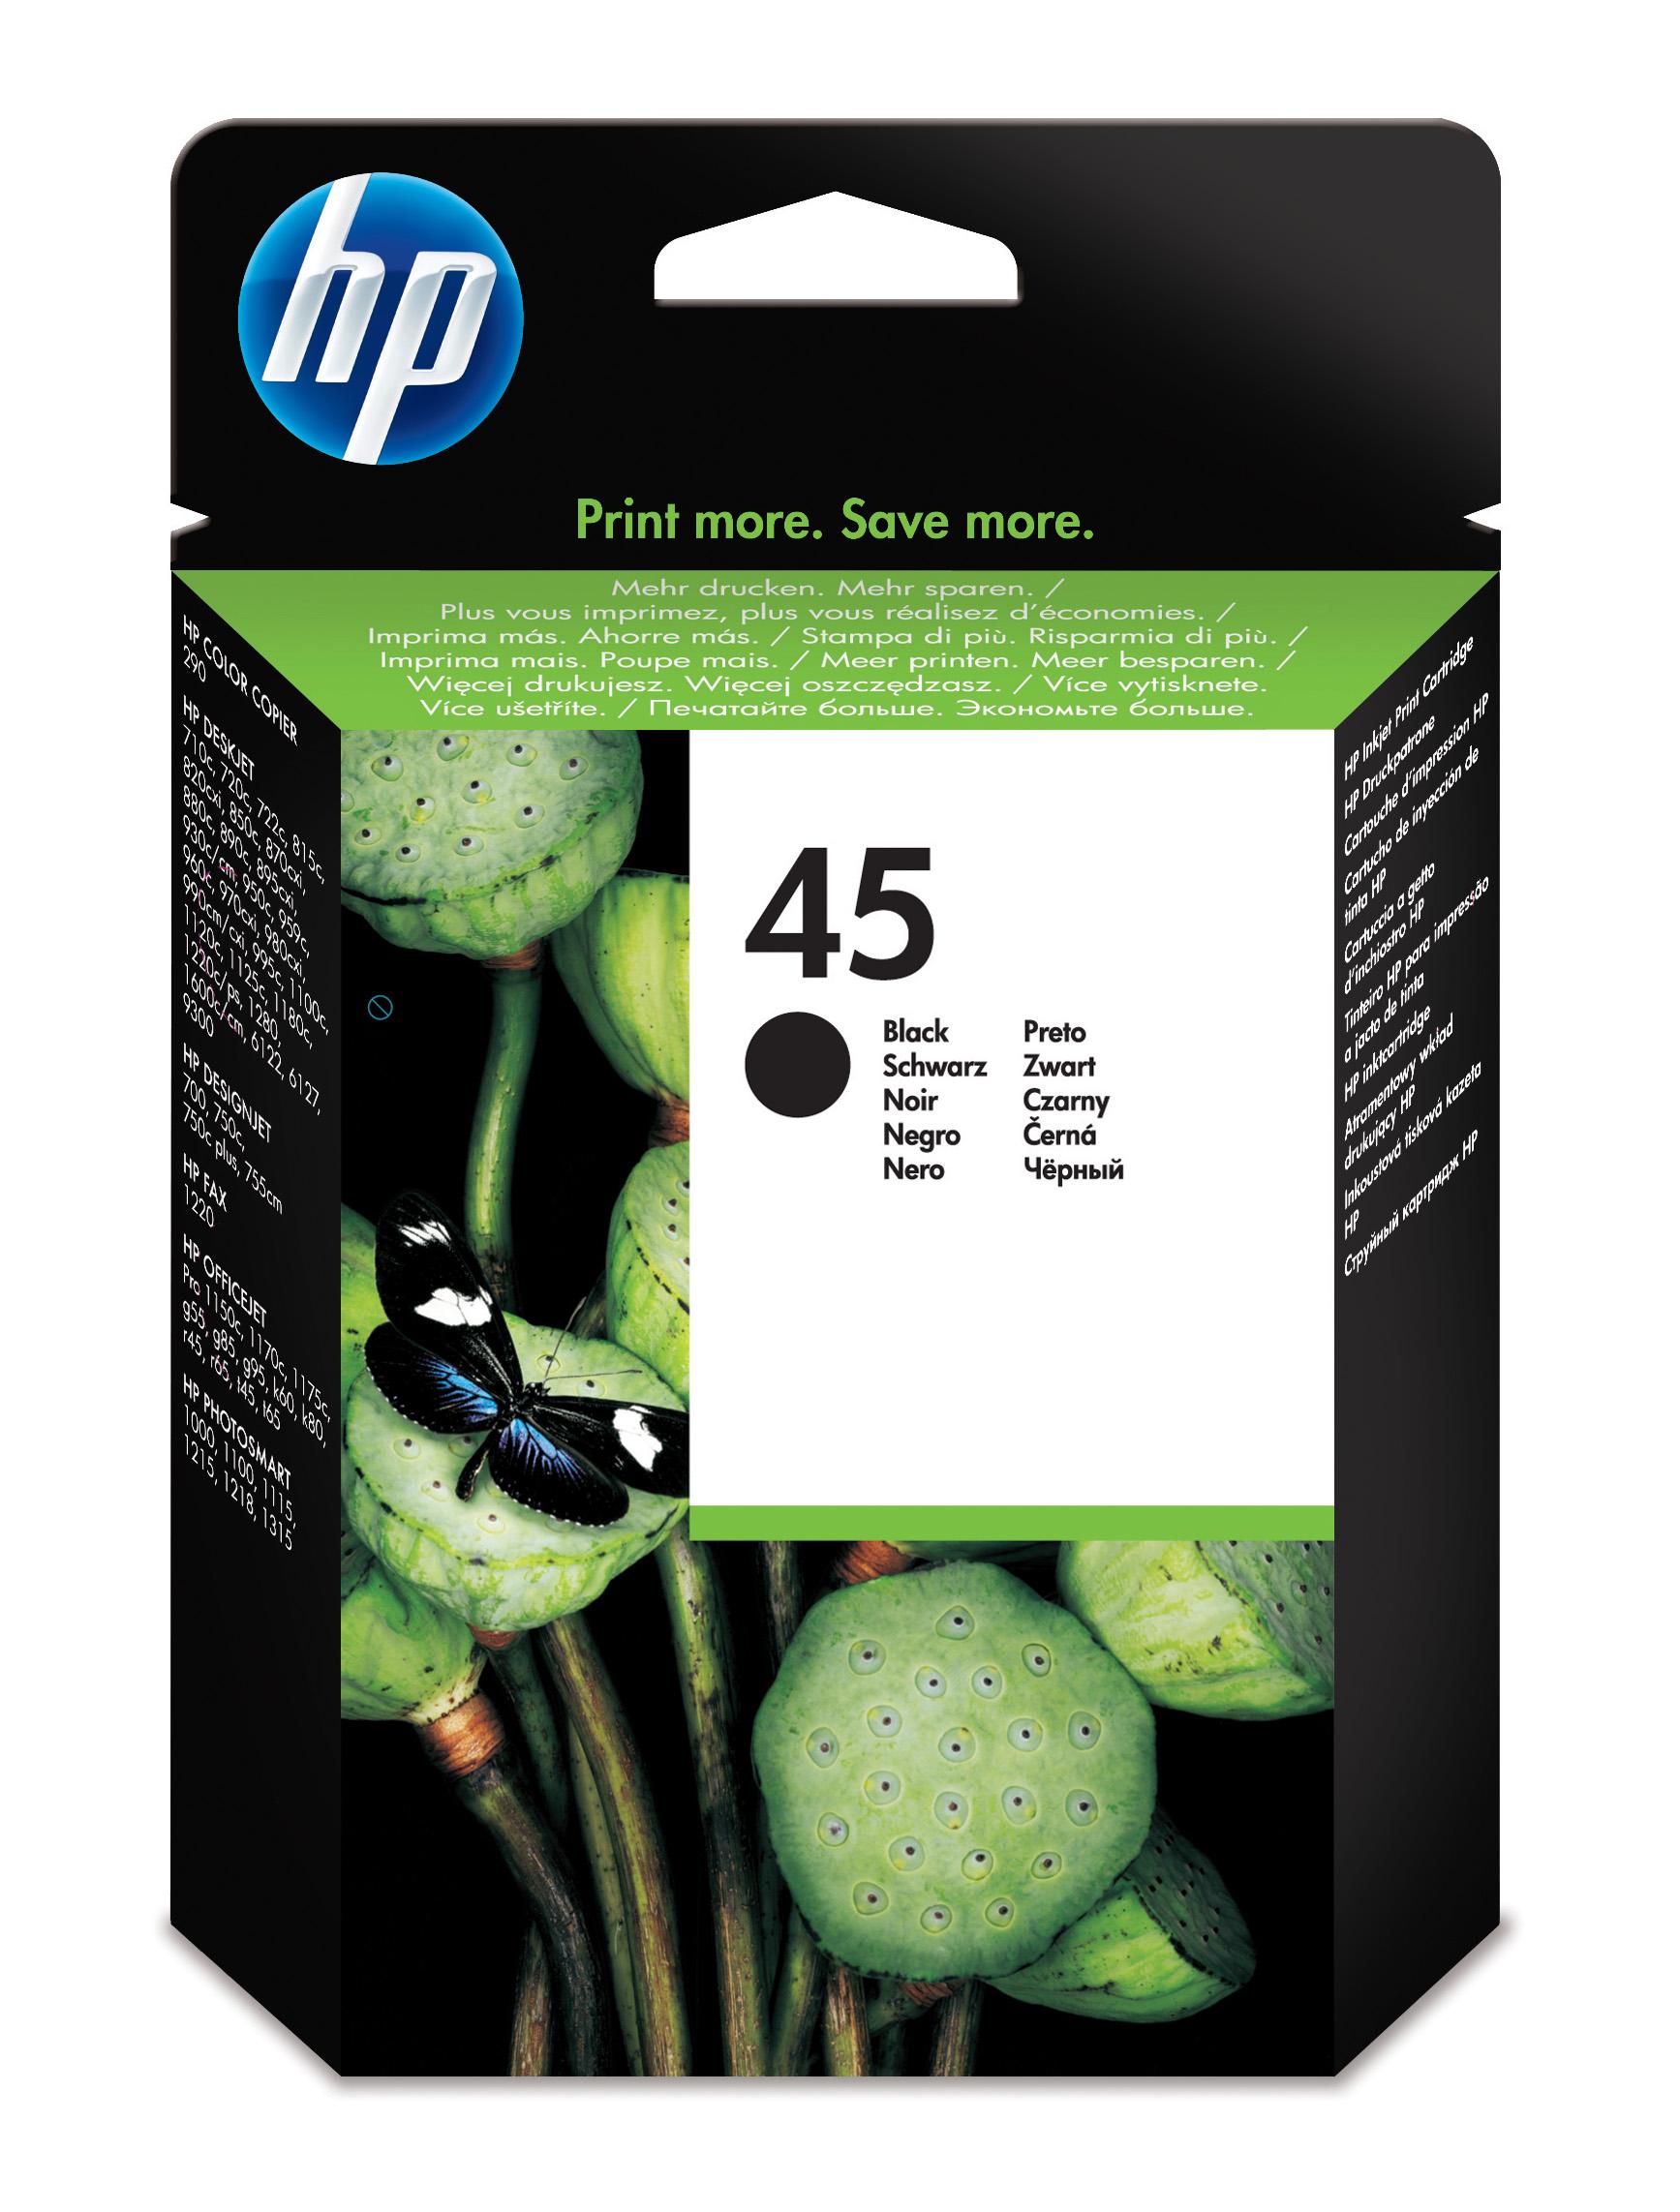 Cartucho inkjet HP 45 (51645AE) Negro